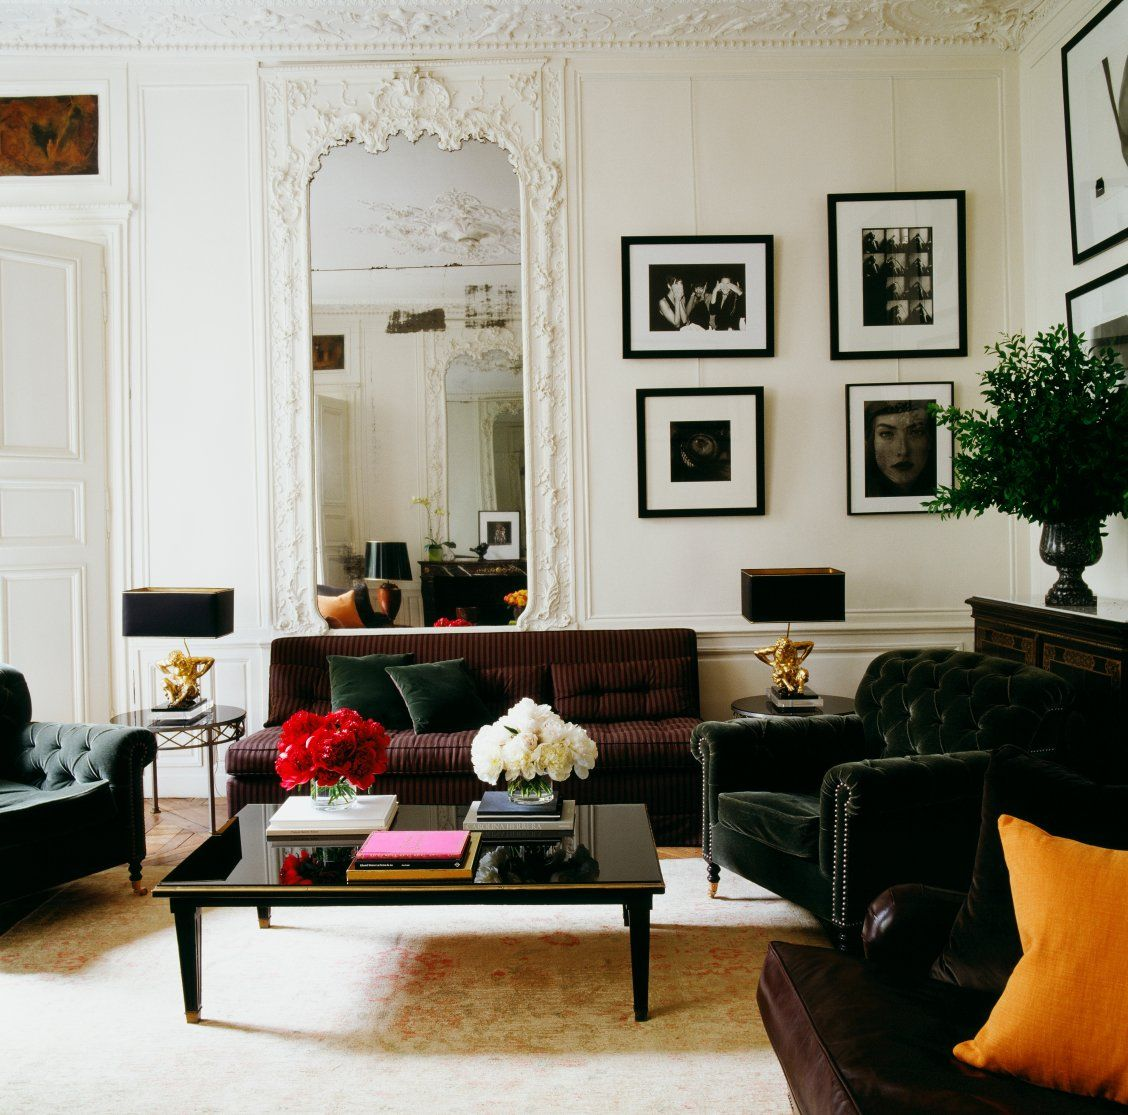 Best interior design websites bathroom shop also parisian apartment inspire chic in pinterest rh